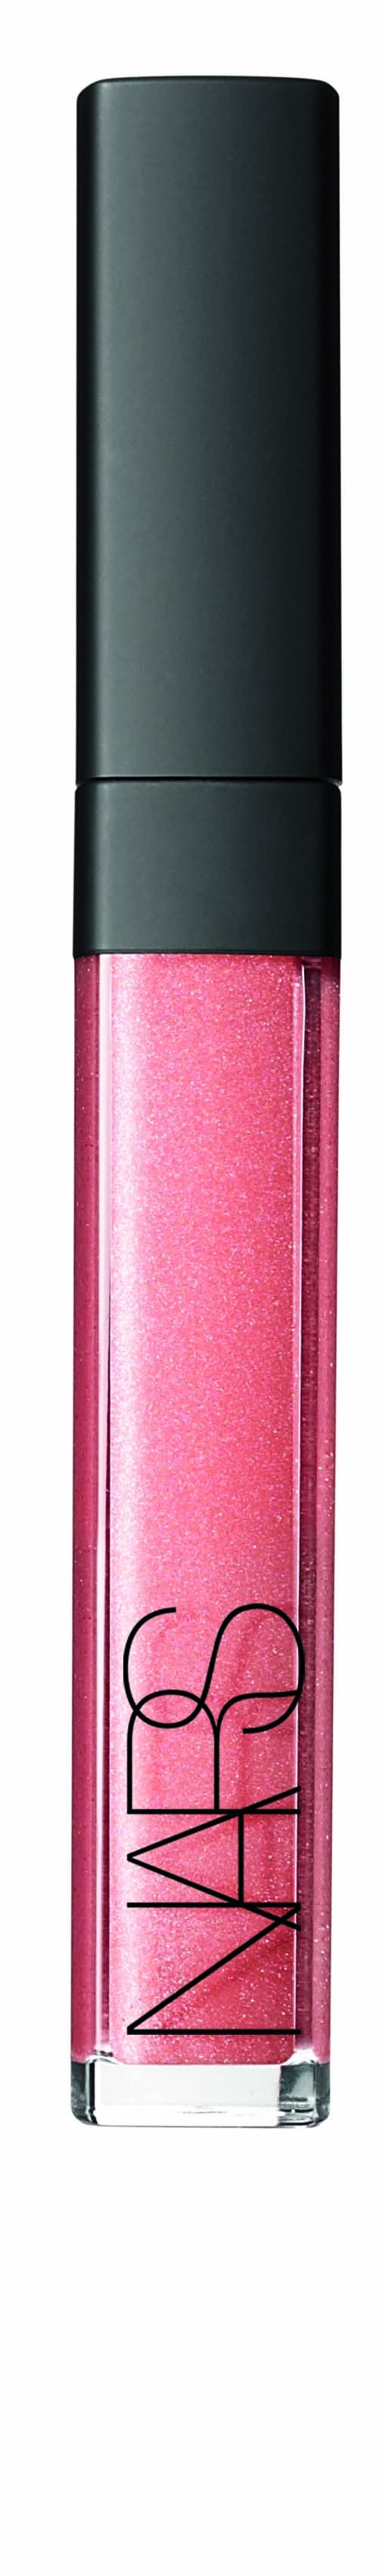 Bimini Larger Than Life Lip Gloss ($26)